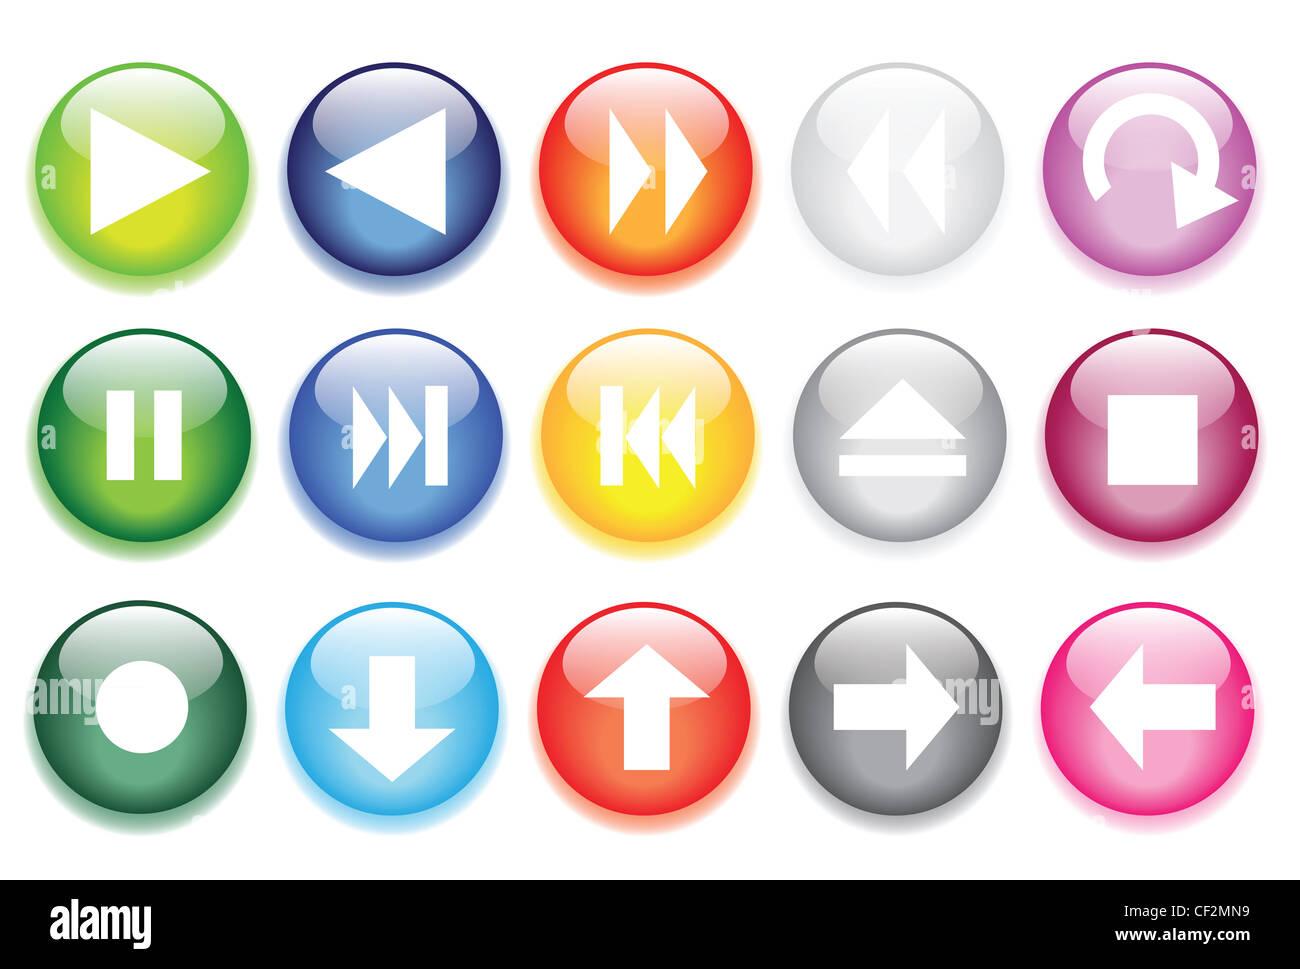 Vektor-Illustrationen glänzend Glas Knöpfe für Icons. Stockbild